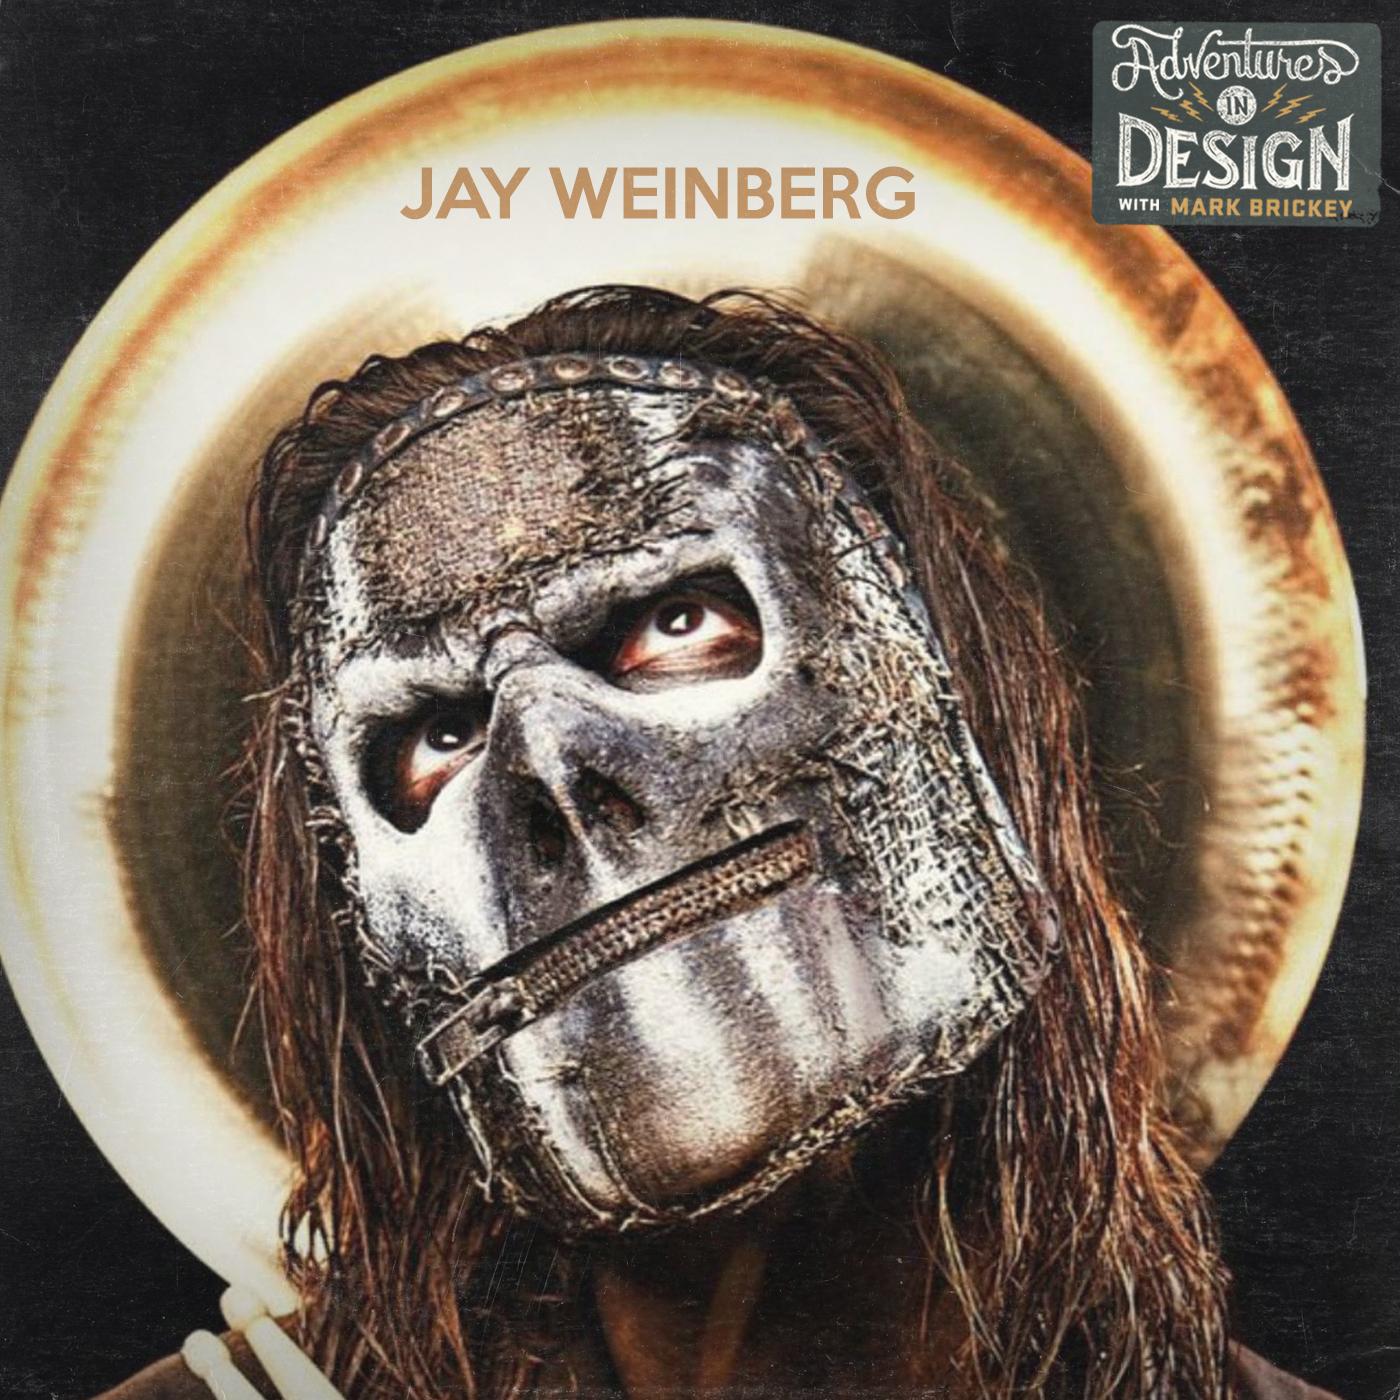 526 - Jay Weinberg